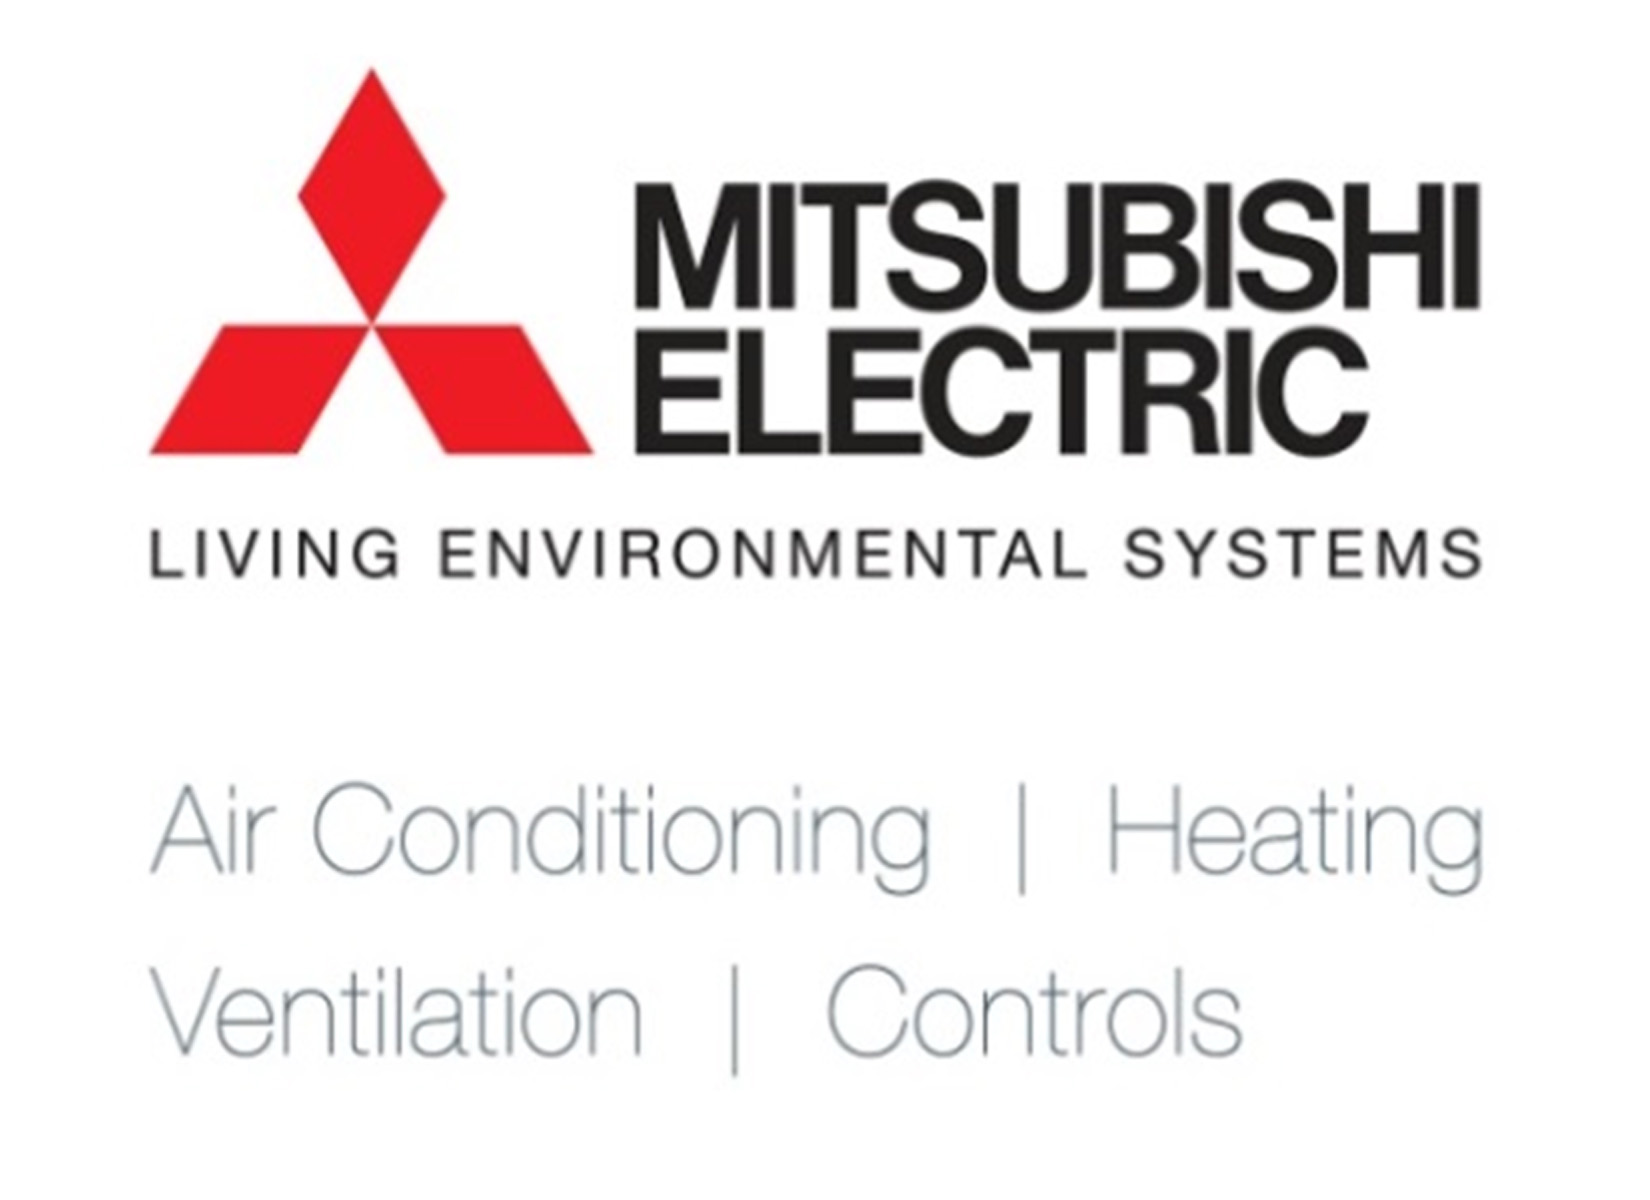 Mitsubishi Electric Living Environmental Systems